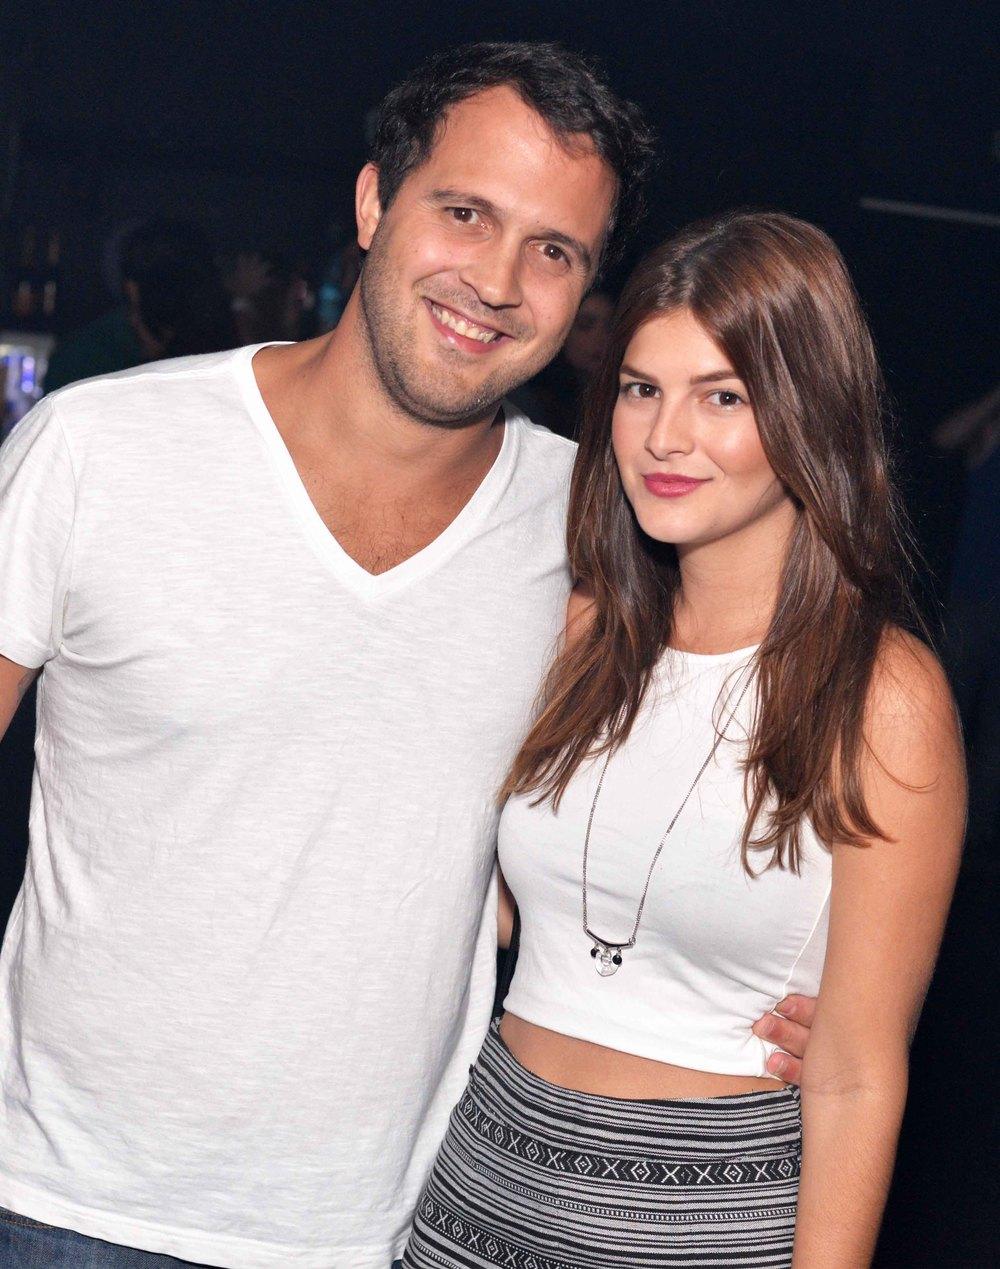 Antonio Carneiro e Luiza Botto.jpg